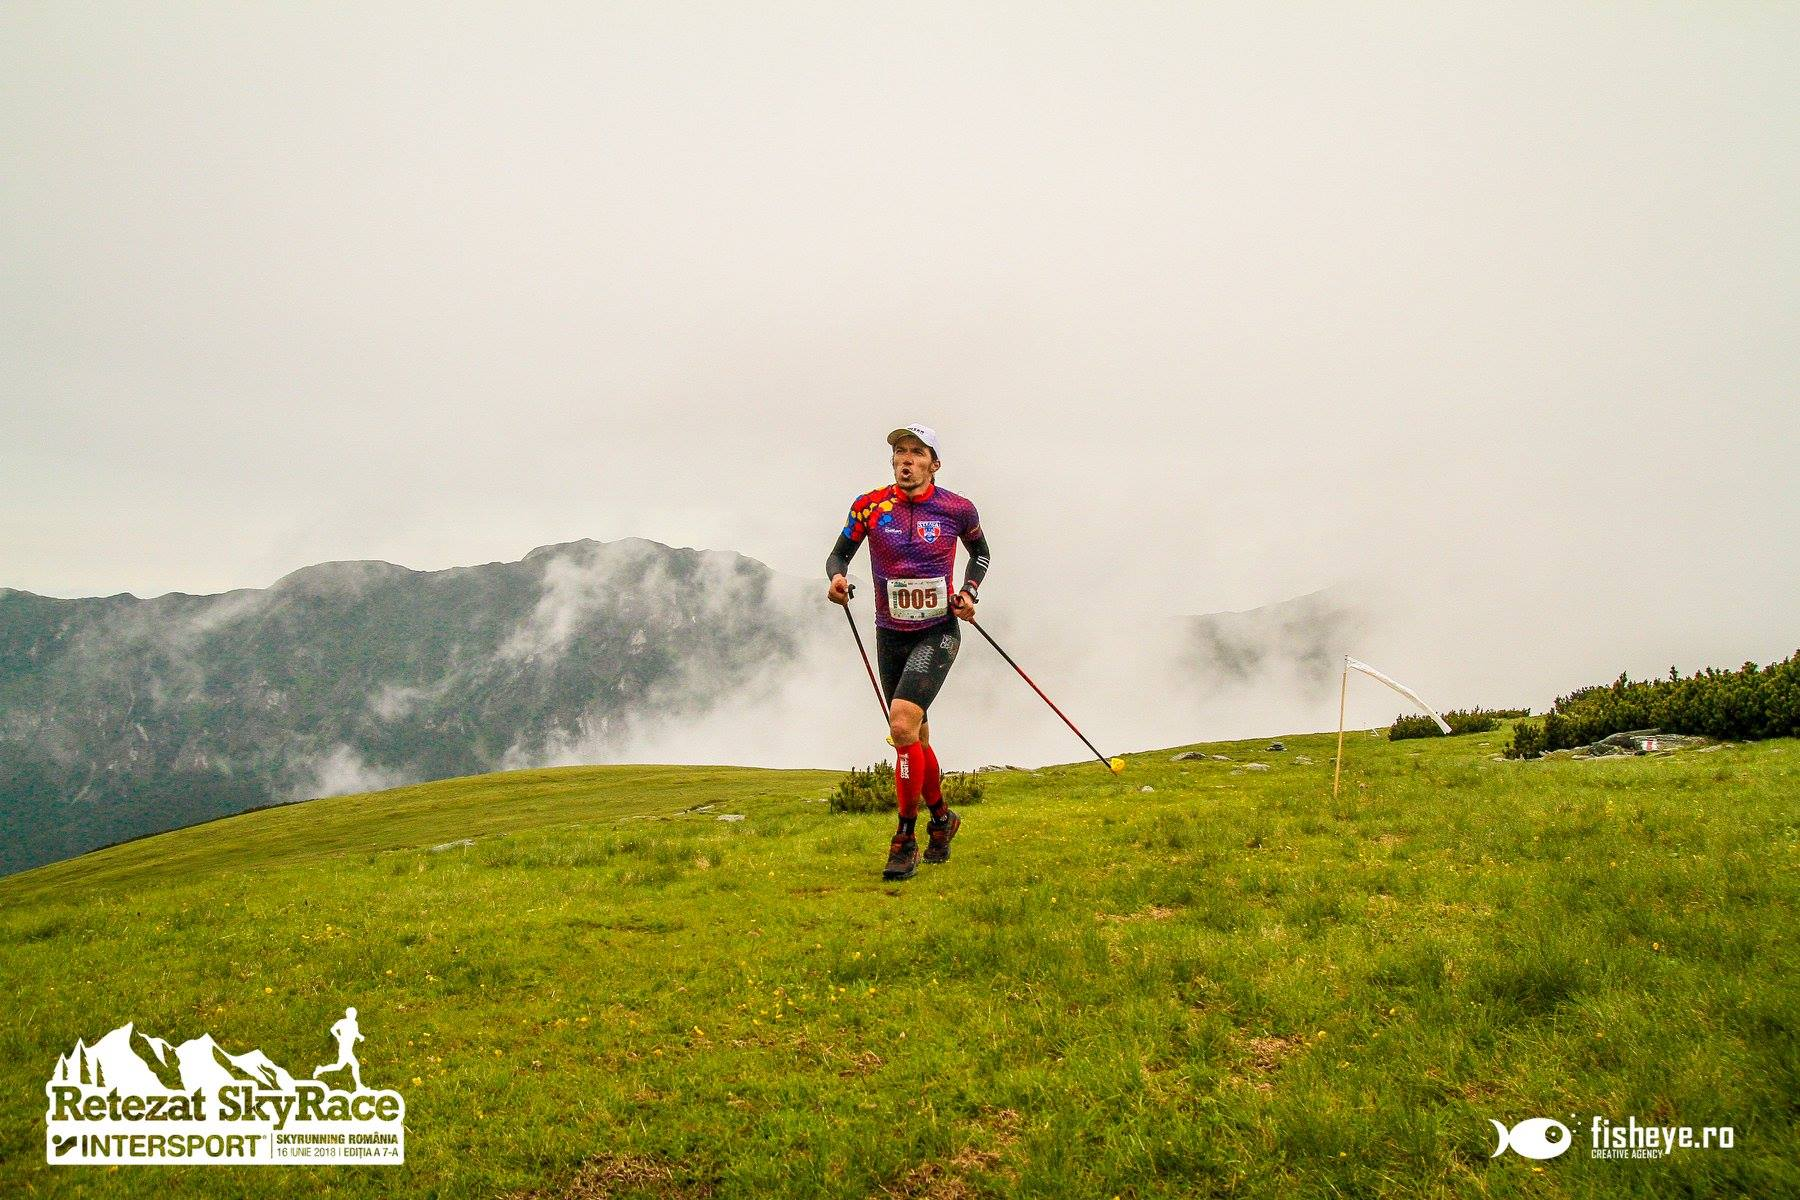 maraton Retezat SkyRace Silviu Bălan